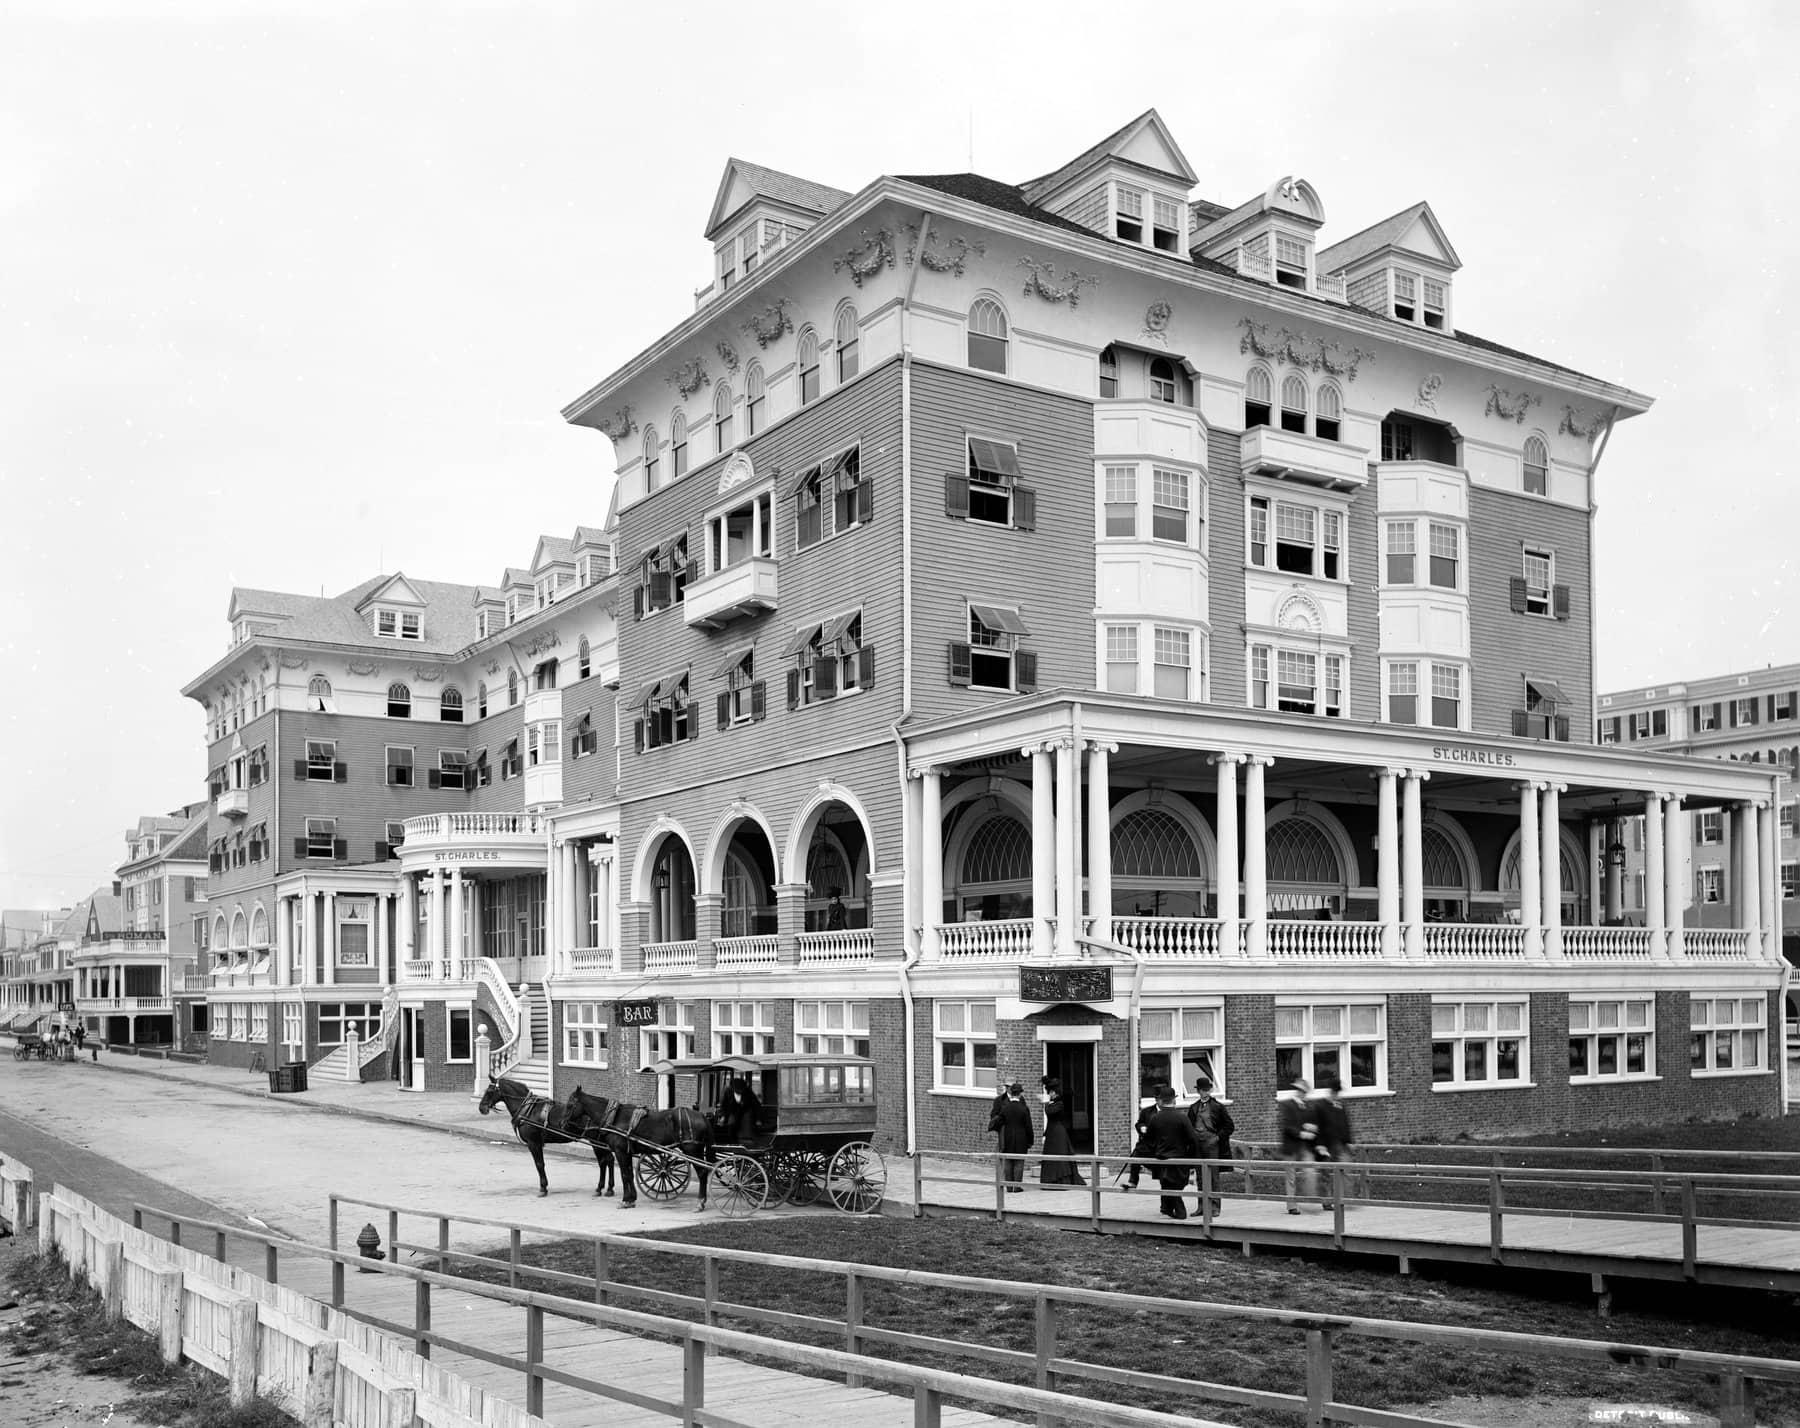 Hotel St. Charles, Atlantic City, New Jersey 1880-1890